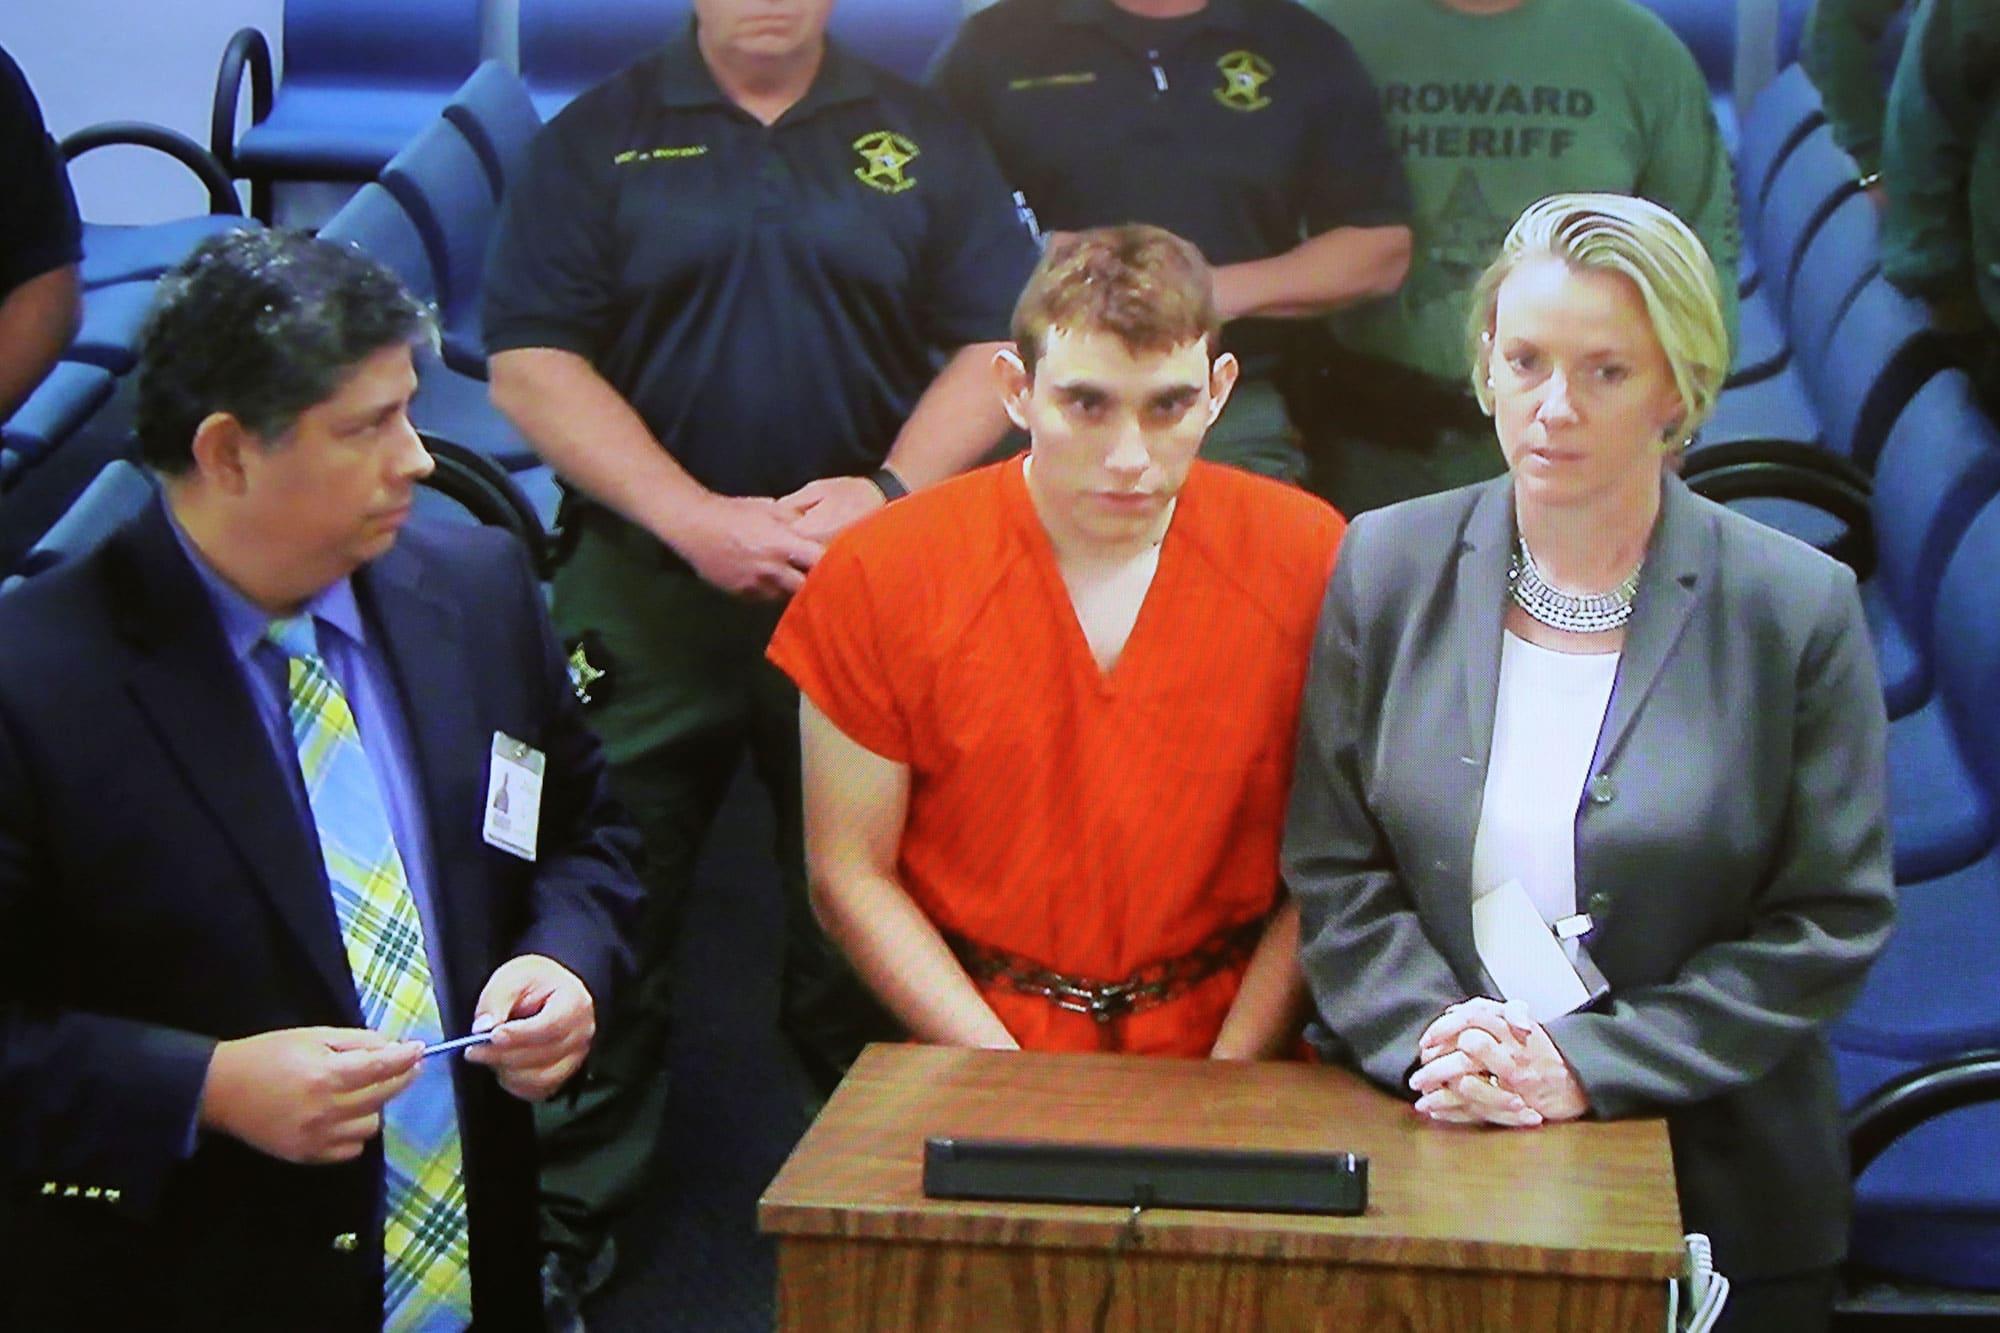 Florida shooting suspect Nikolas Cruz poised for 800,000 inheritance recommend